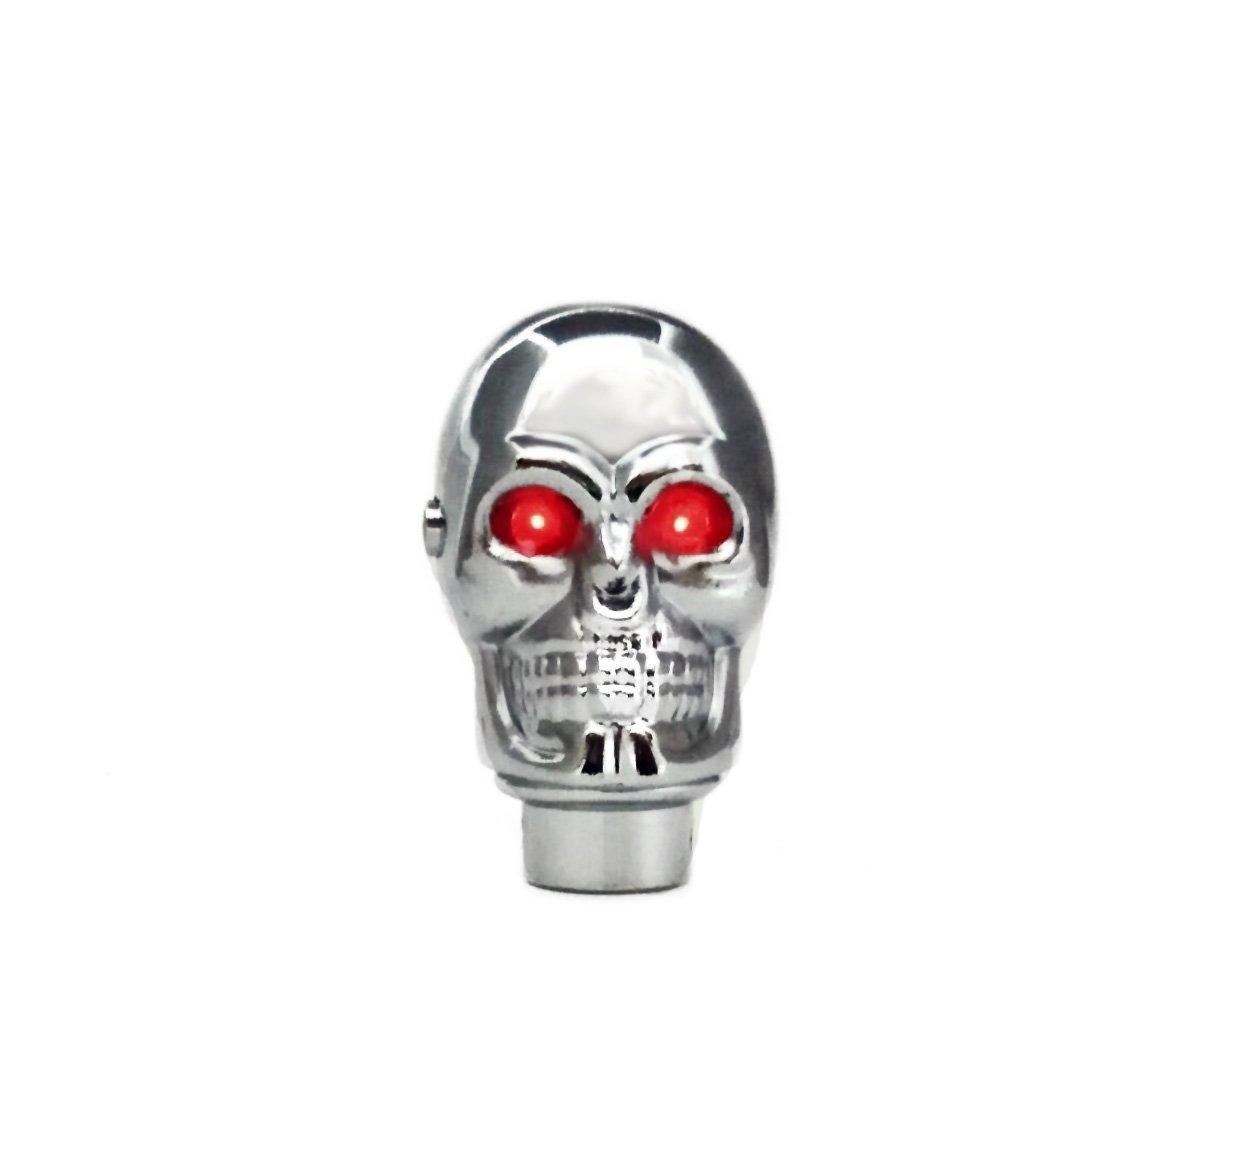 LED Light Red Eyes TESWNE Silver Chrome Skull Gear Shift Knob Manual Stick Shift Knobs